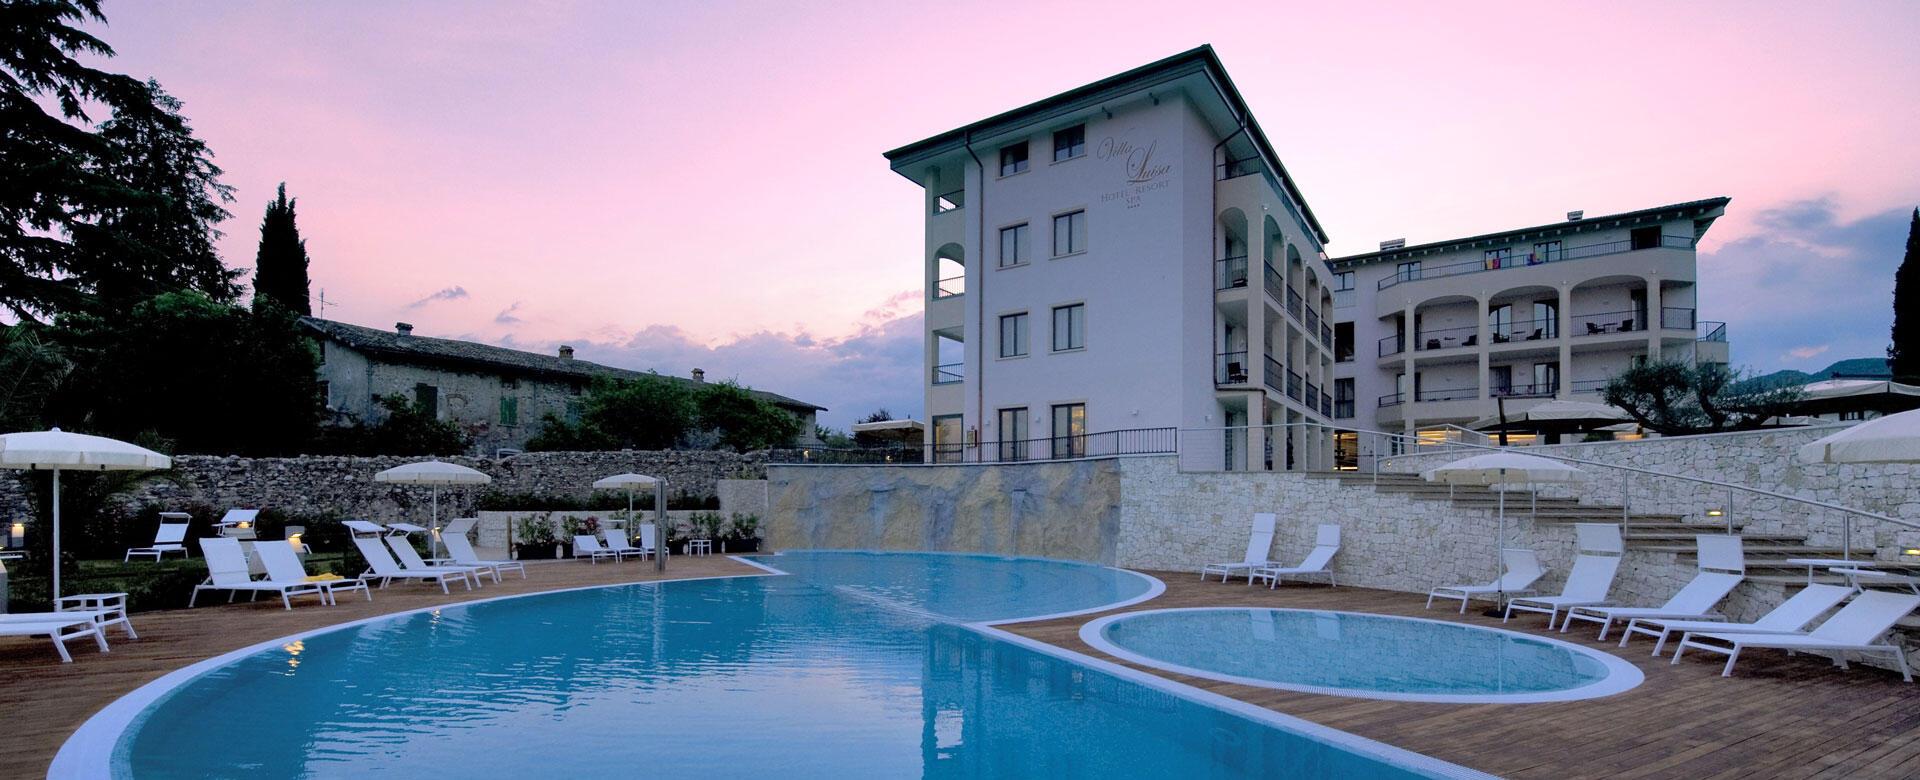 hotelvillaluisa en safe-holiday 004